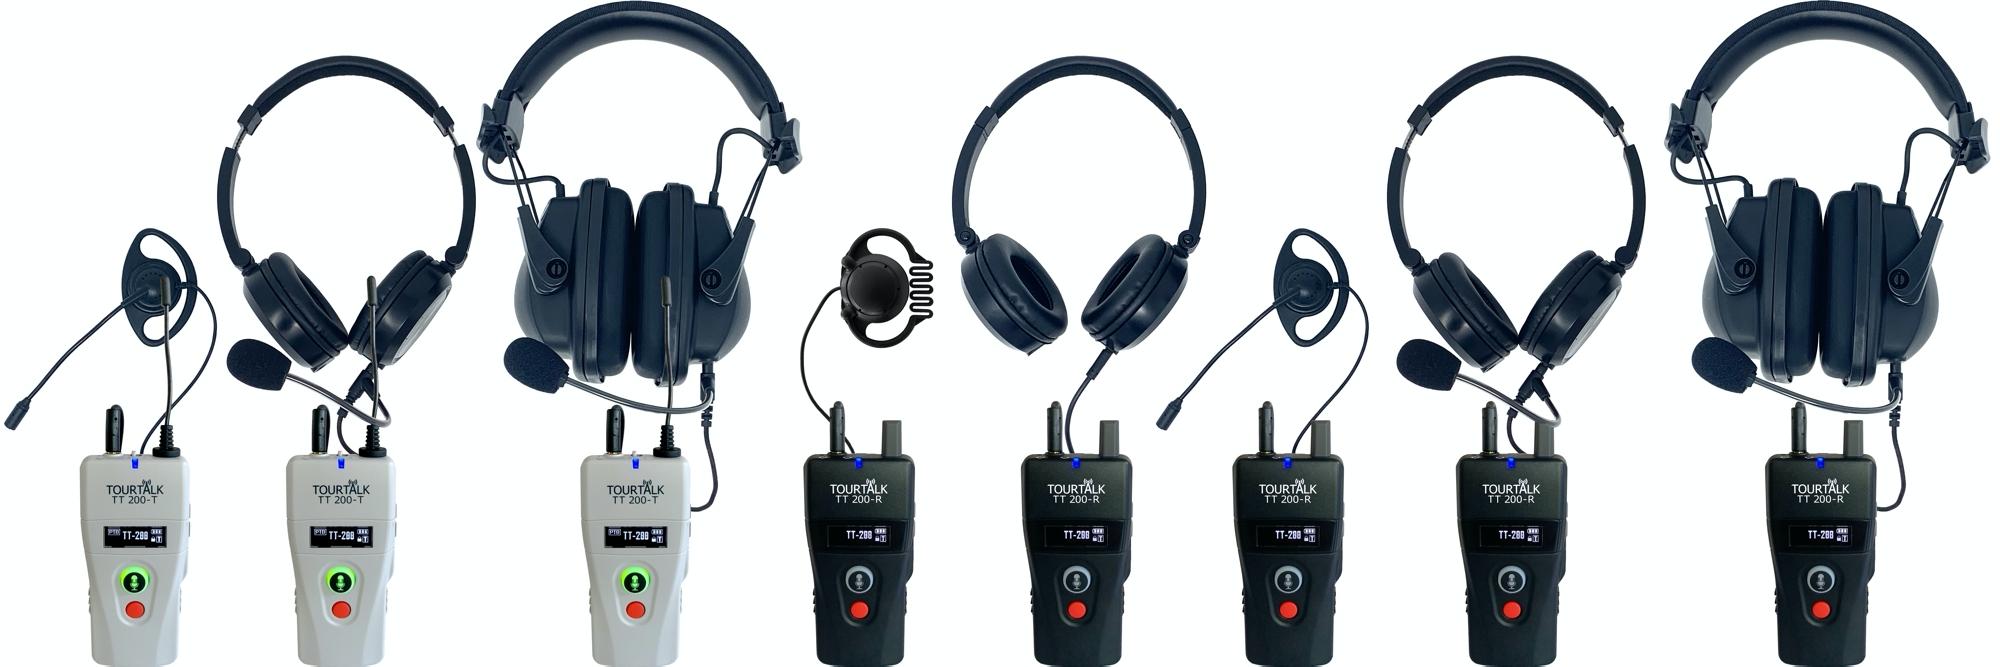 Tourtalk TT 200-T and TT 200-R headsets example